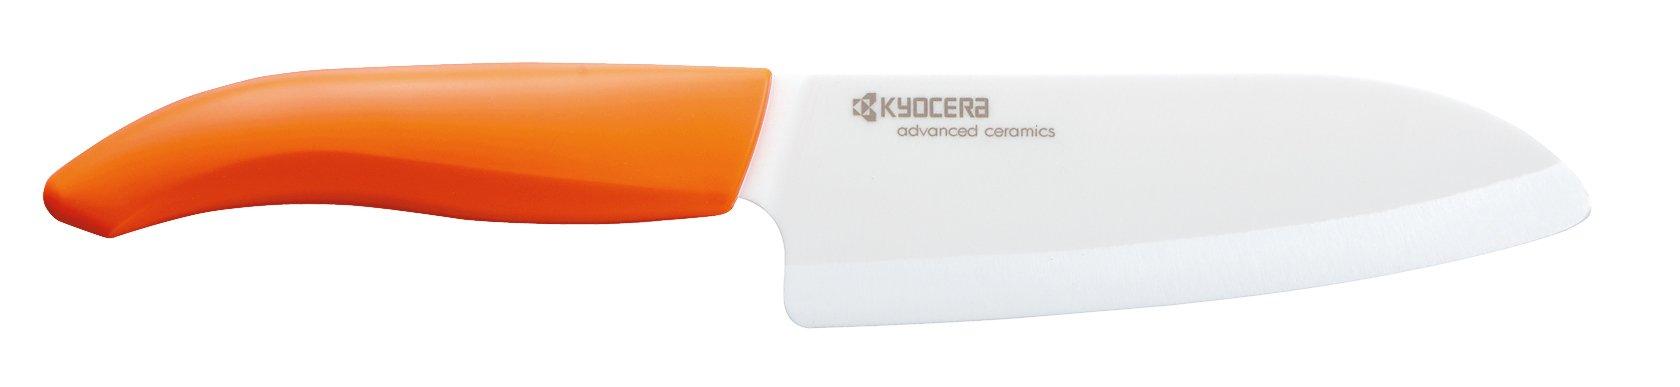 Kyocera Advanced Ceramic Revolution Series 5-1/2-inch Santoku Knife, Orange Handle, White Blade